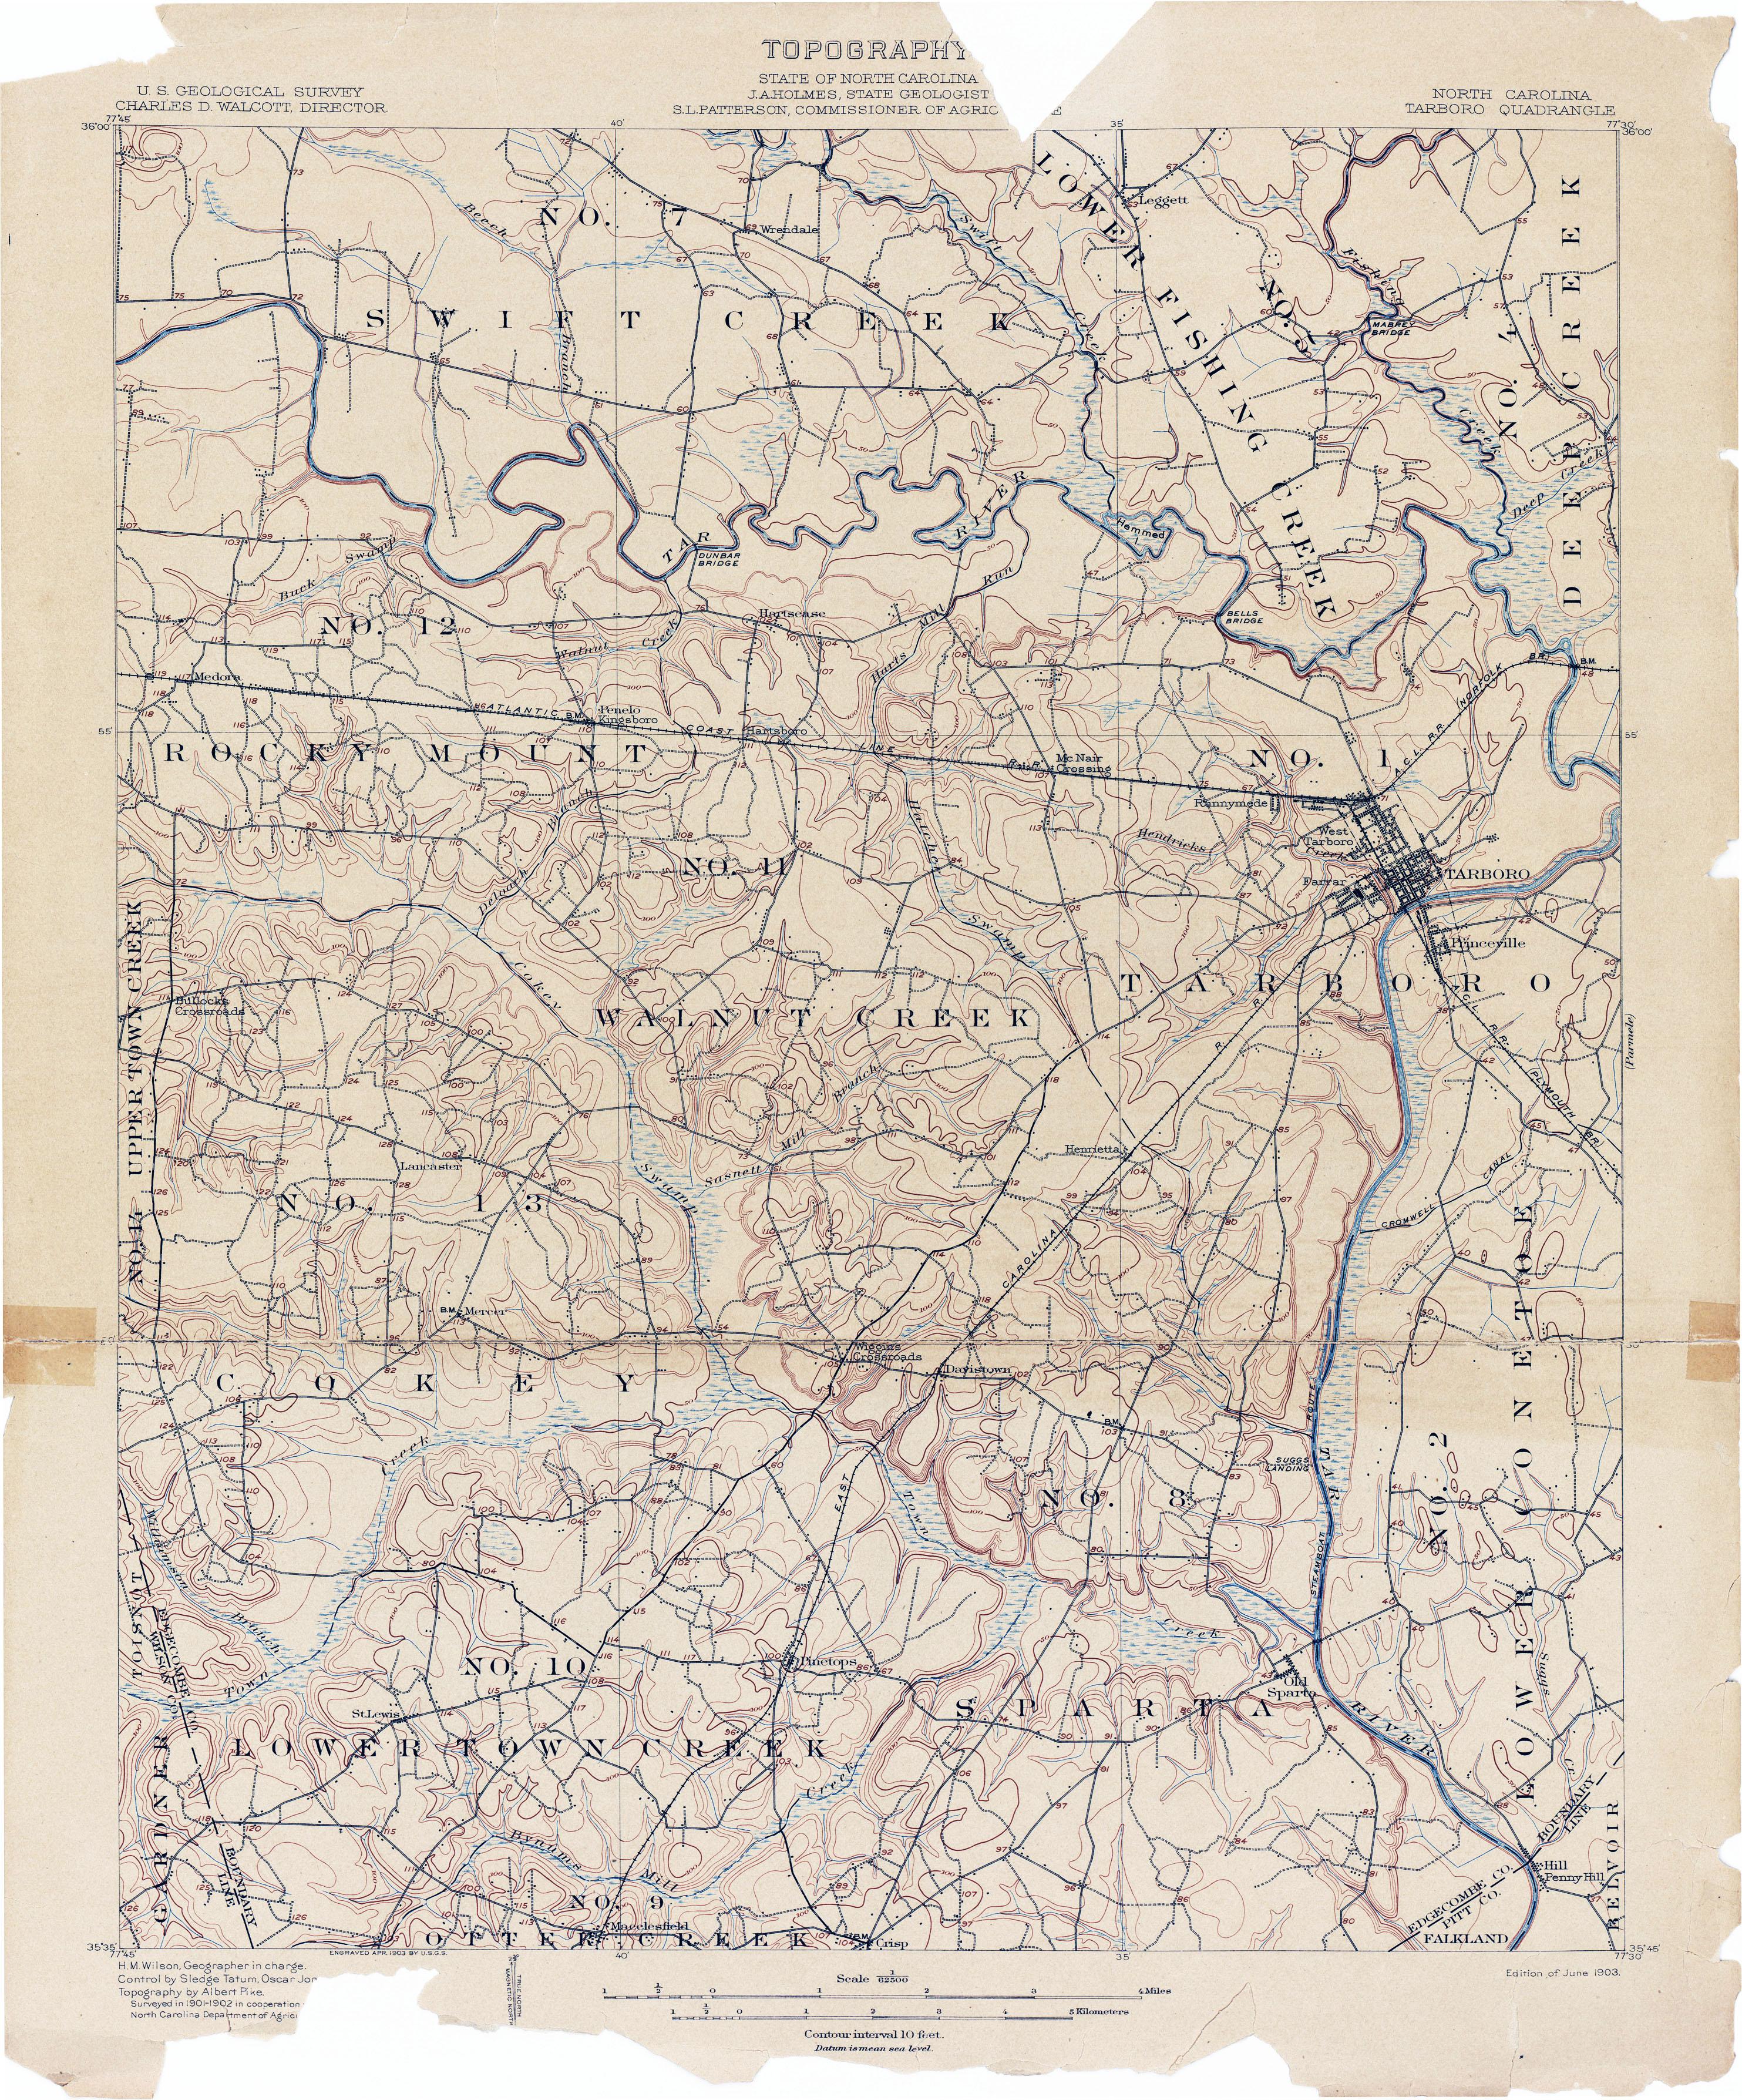 North Carolina Historical Topographic Maps PerryCastañeda Map - Map of no carolina